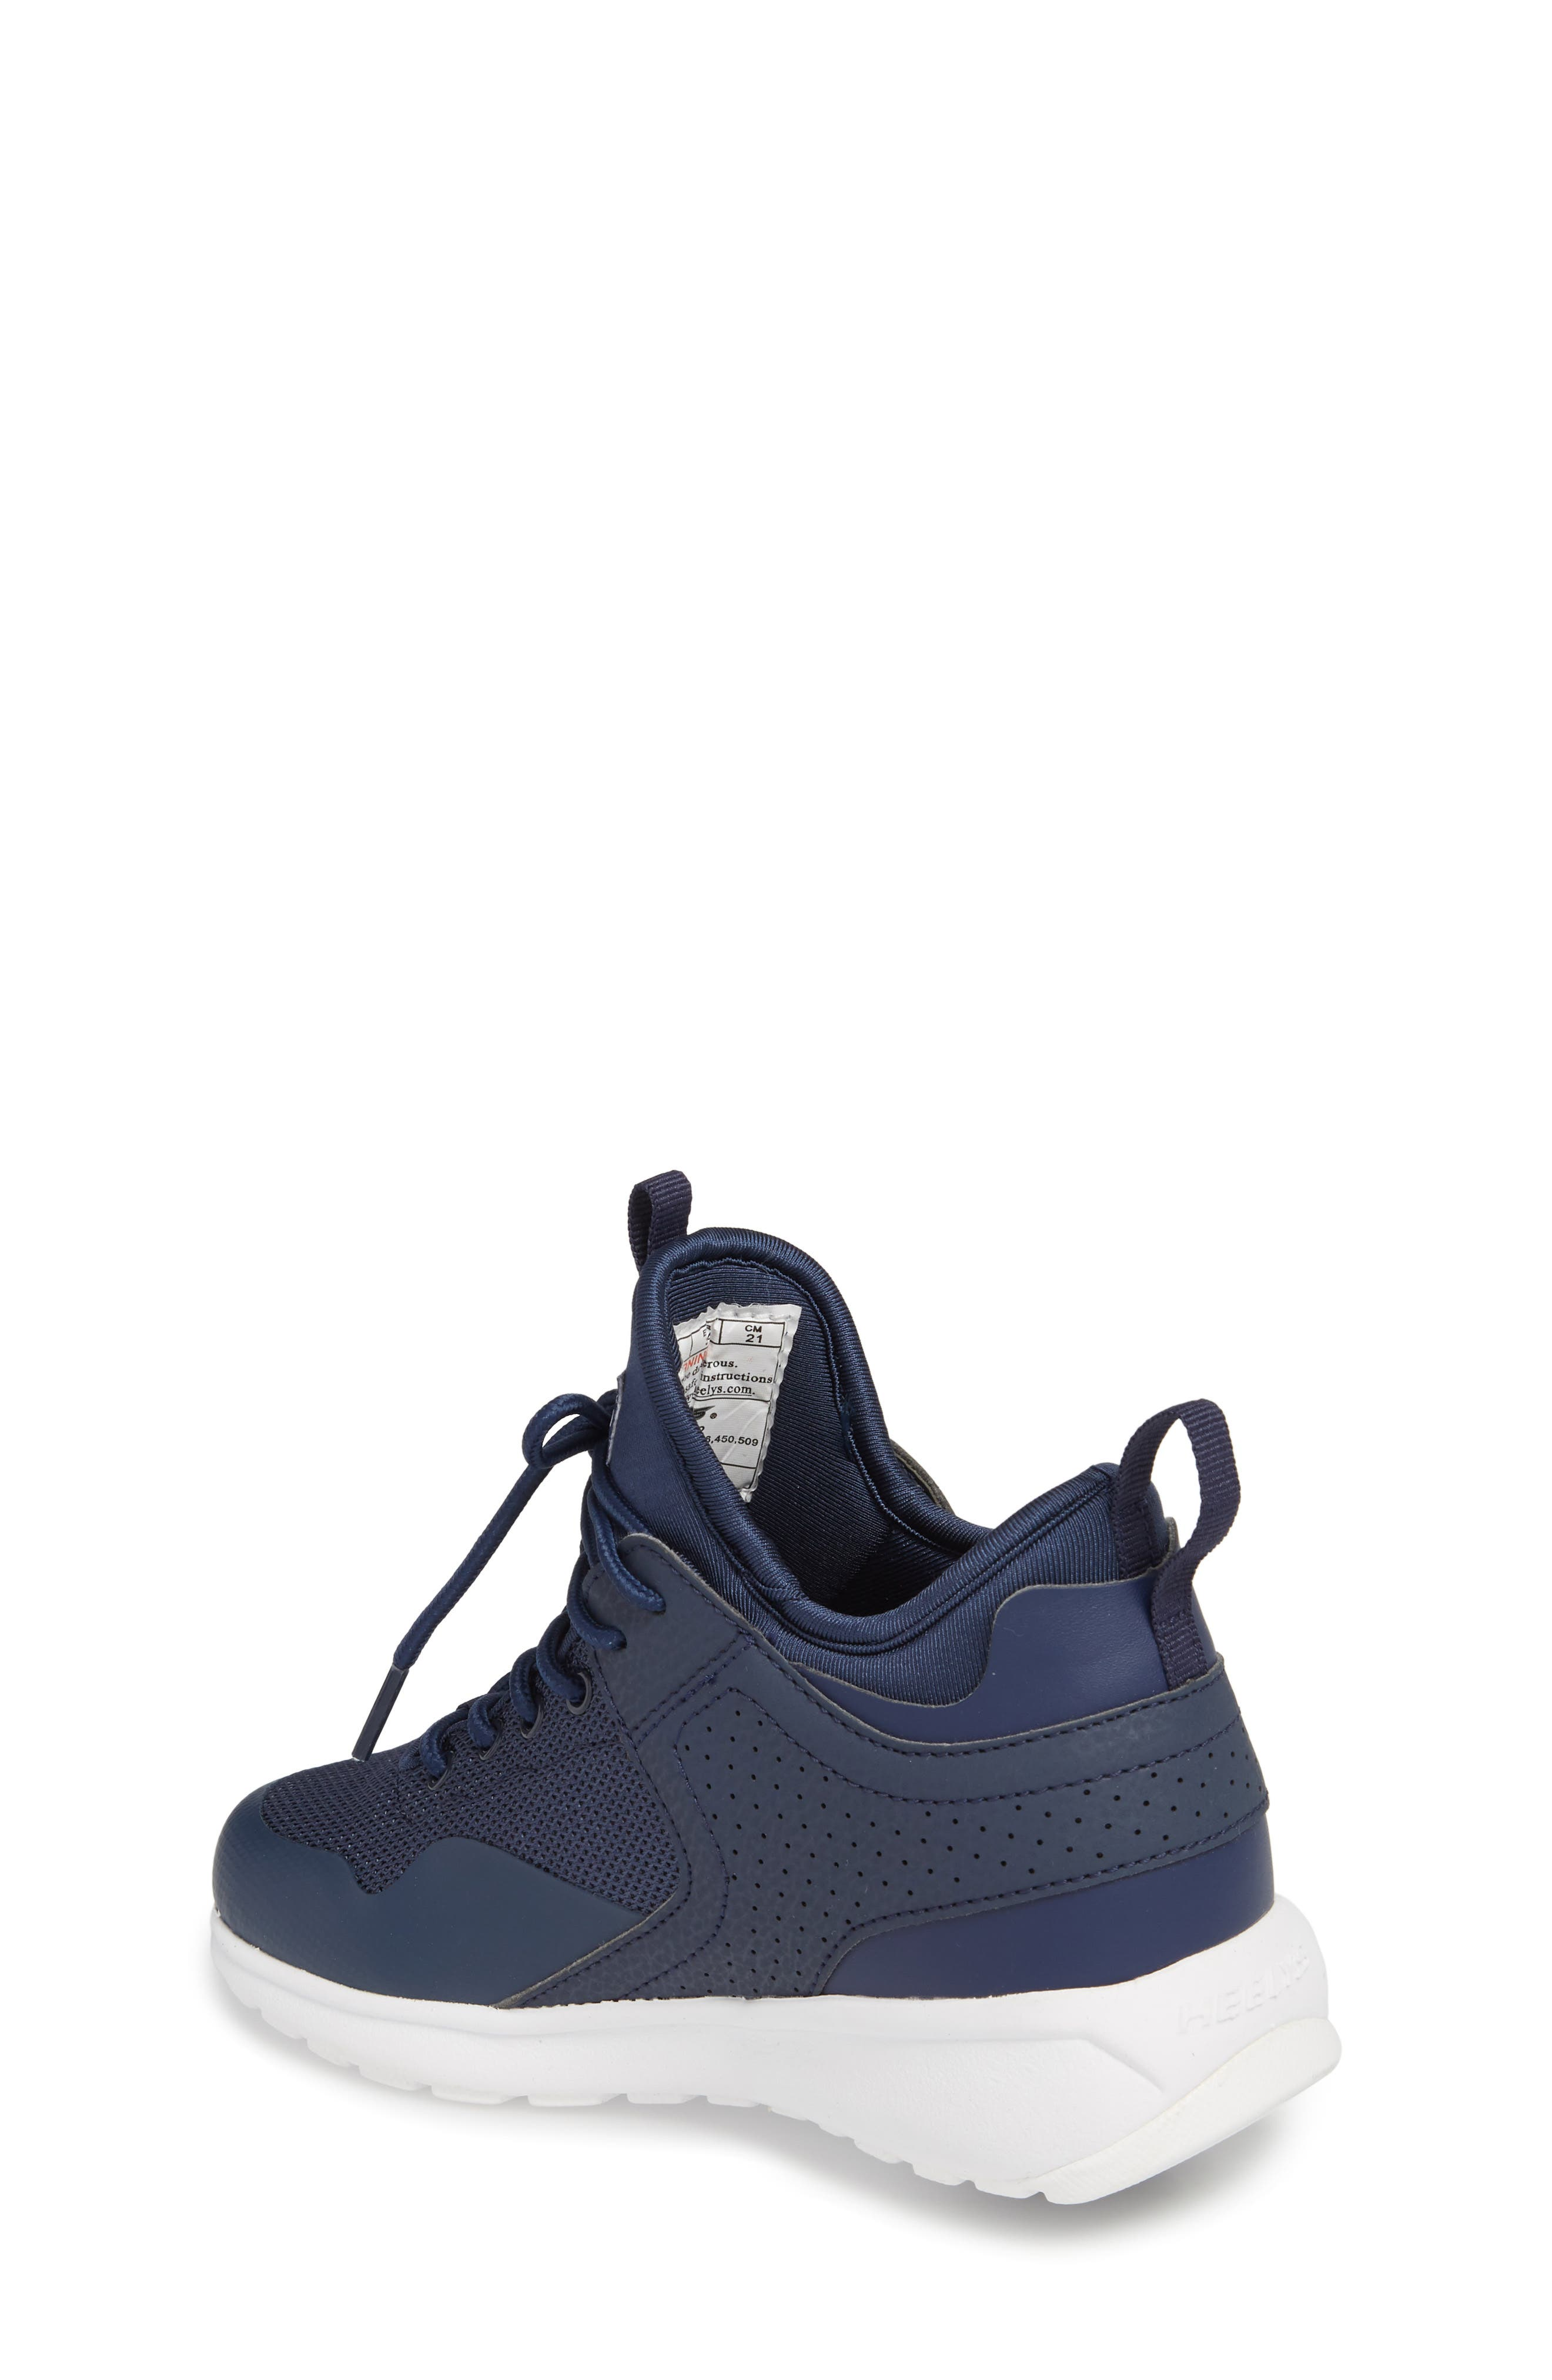 Piper Sneaker,                             Alternate thumbnail 2, color,                             411